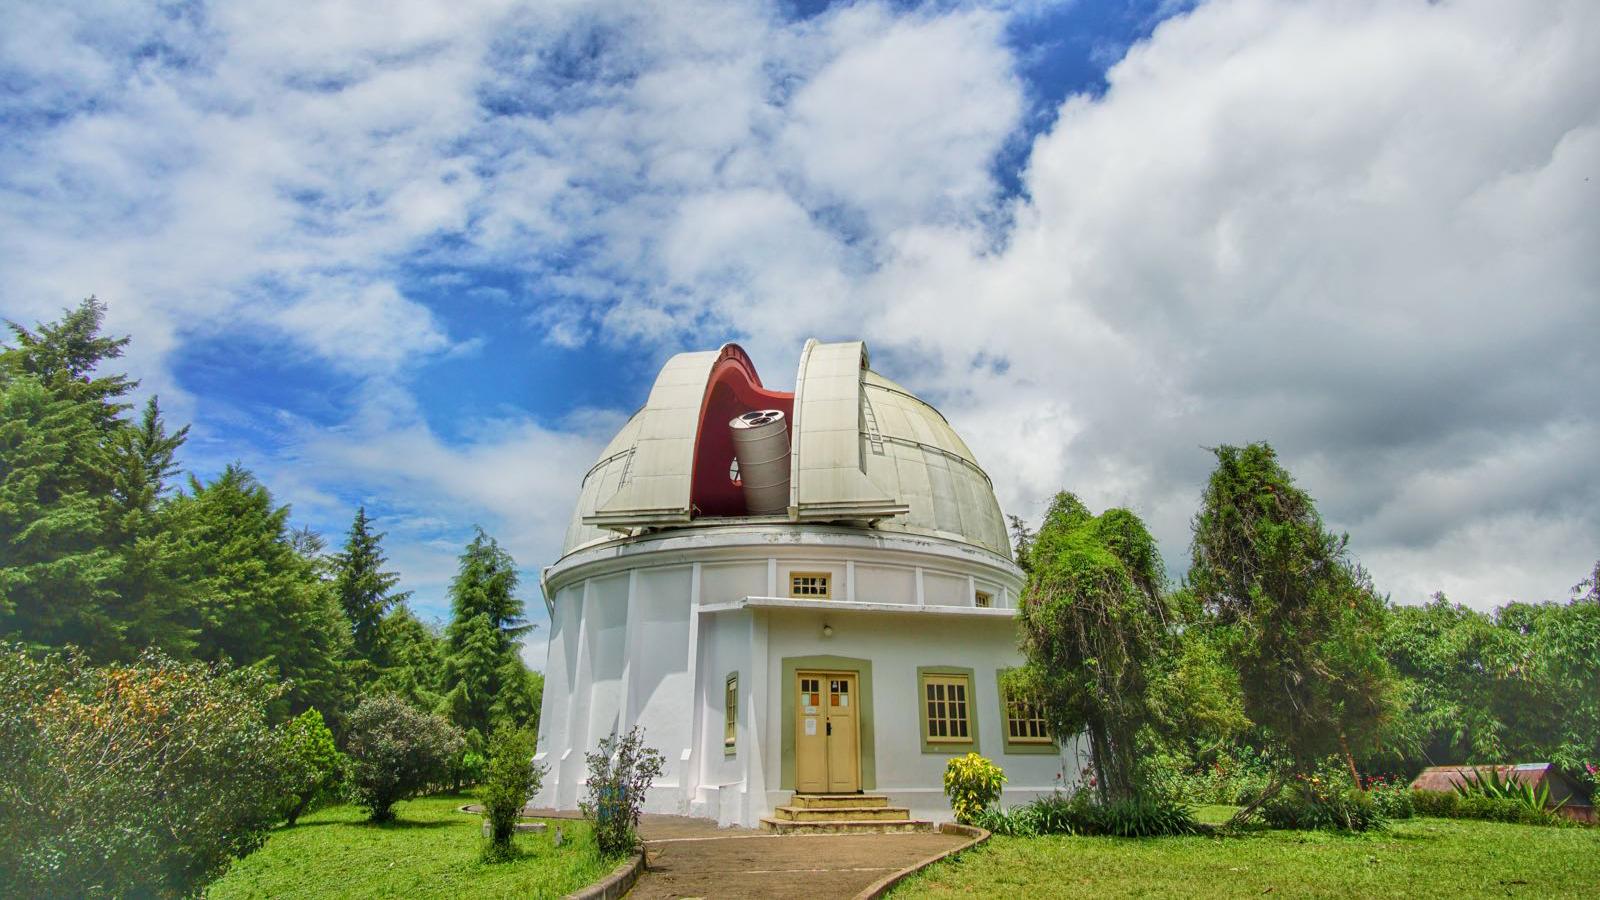 Portal Wisata Kbb Kabupaten Bandung Barat Observatorium Bosscha Lembang Observatory